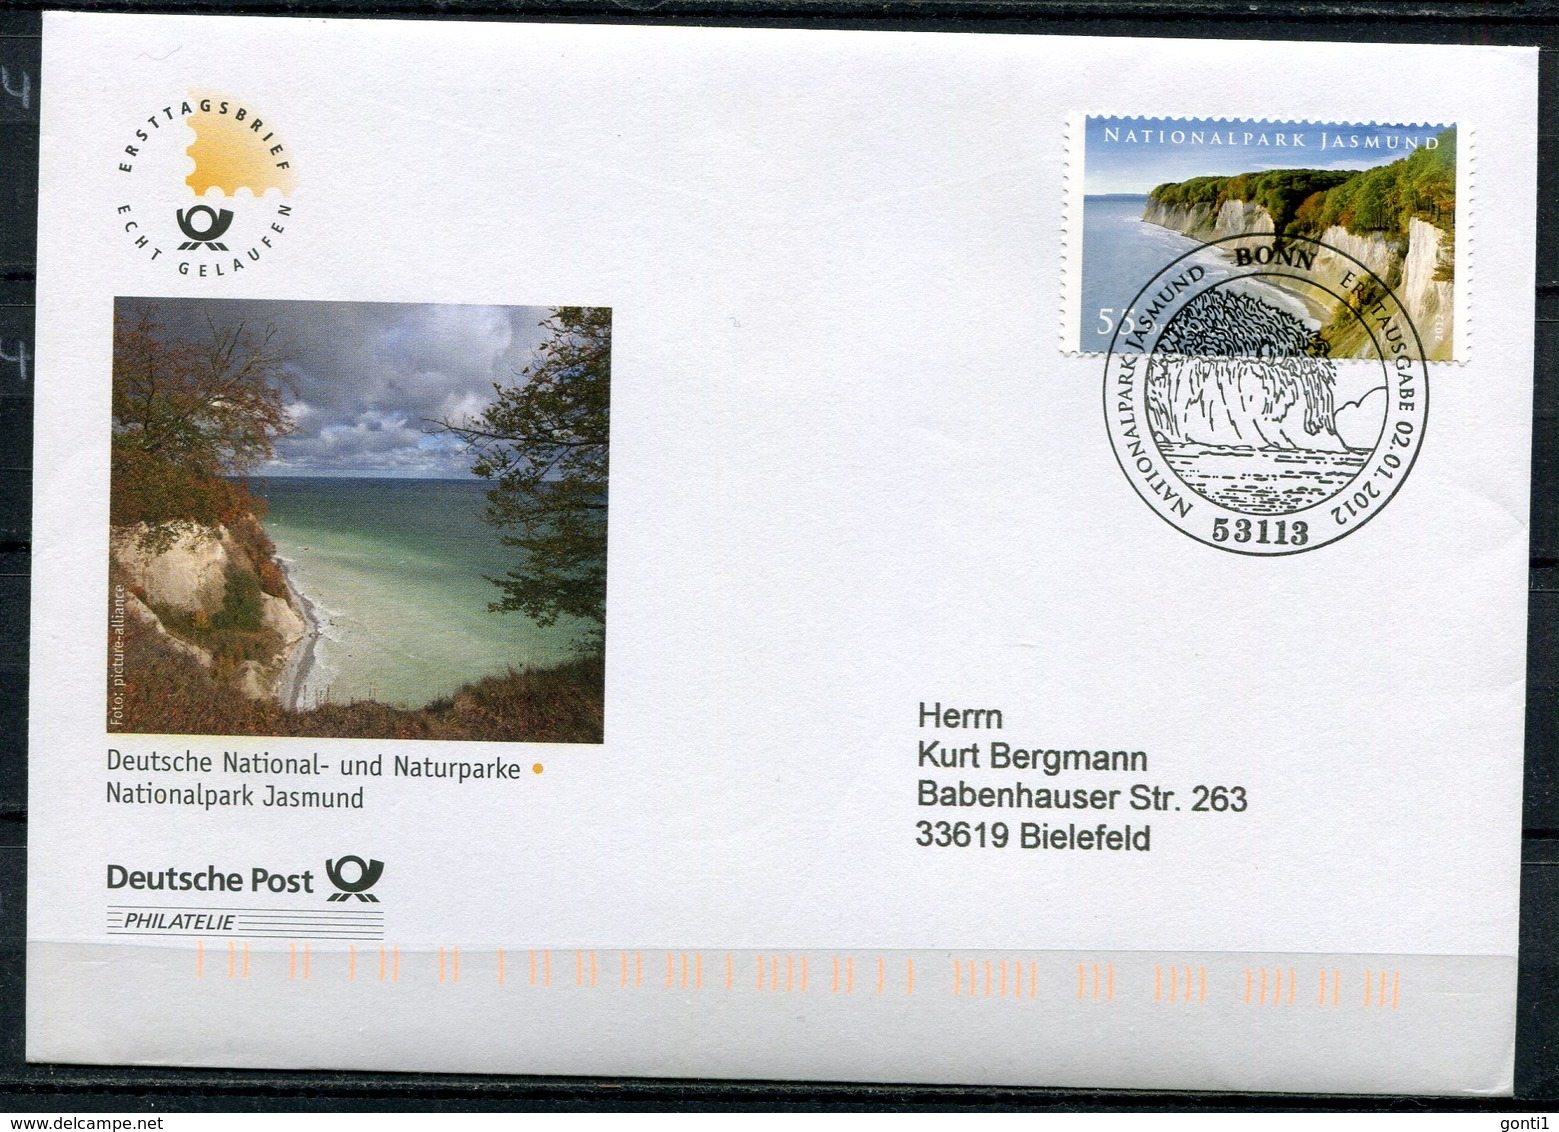 "First Day Cover Germany 2012 Mi.Nr.2908 Ersttagsbrief""Deutschland-Nationalpark,Jasmund"" 1 FDC - FDC: Covers"